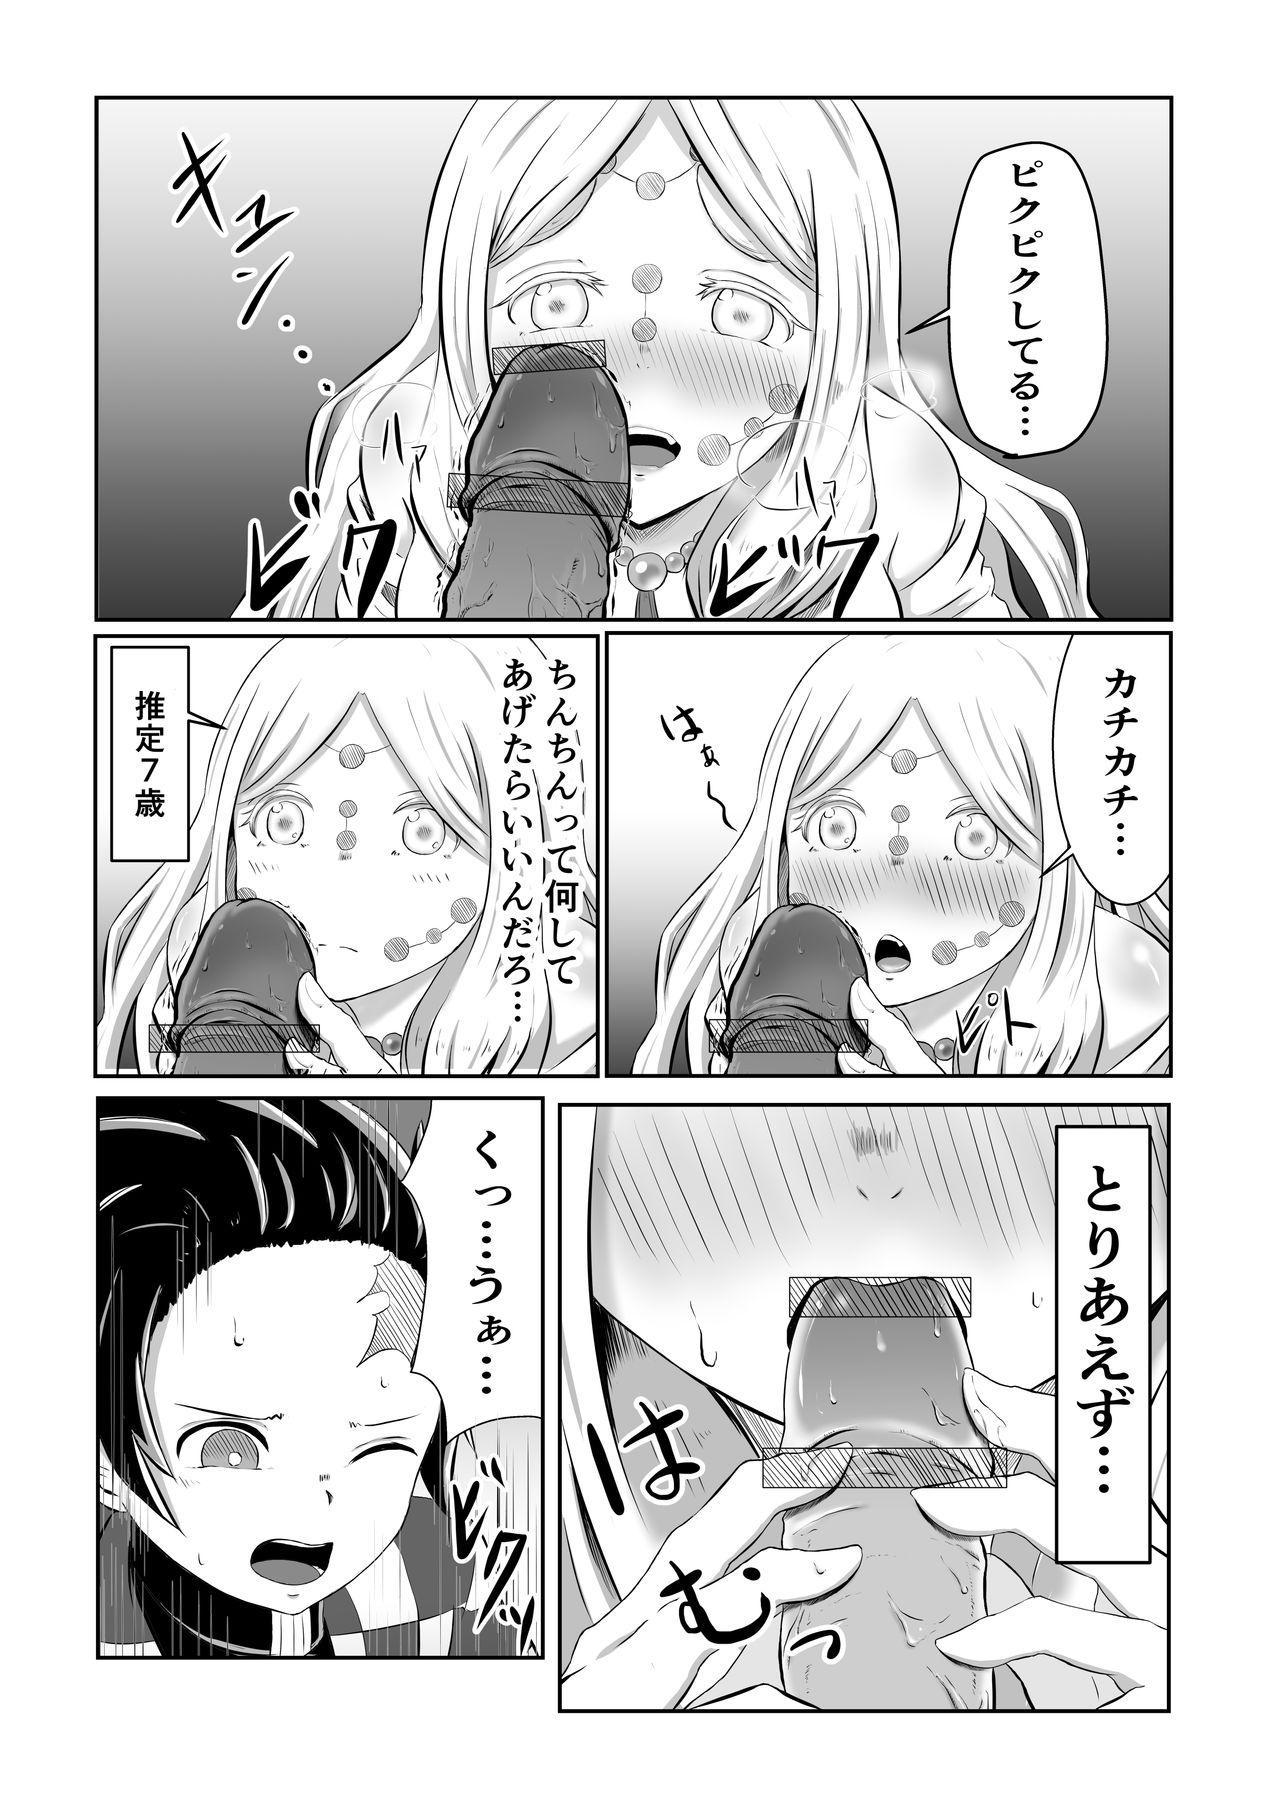 Hinokami Sex. 11